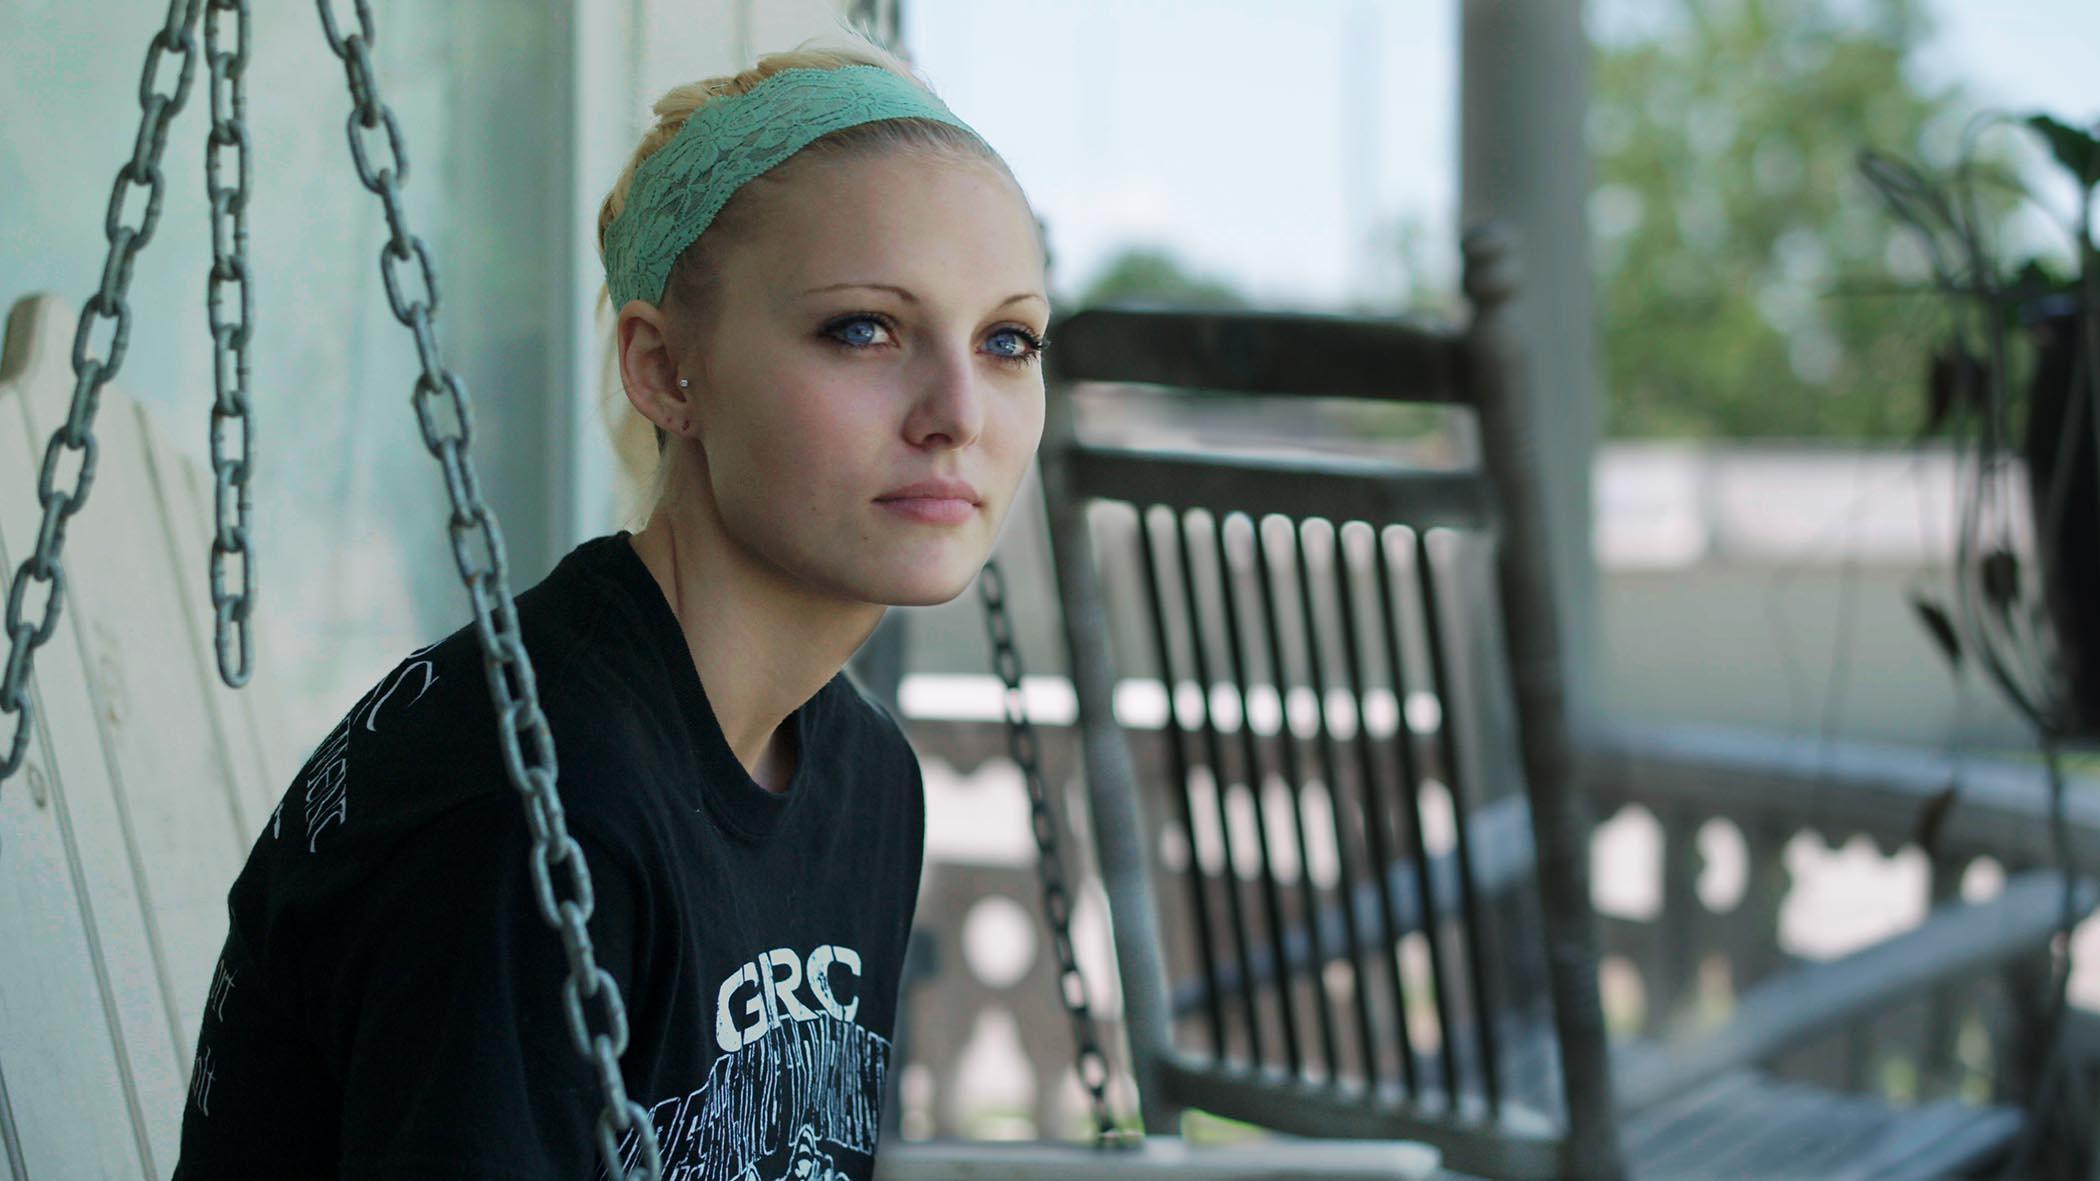 Analysis: Netflix Documentary Brings The Maryville Rape Case